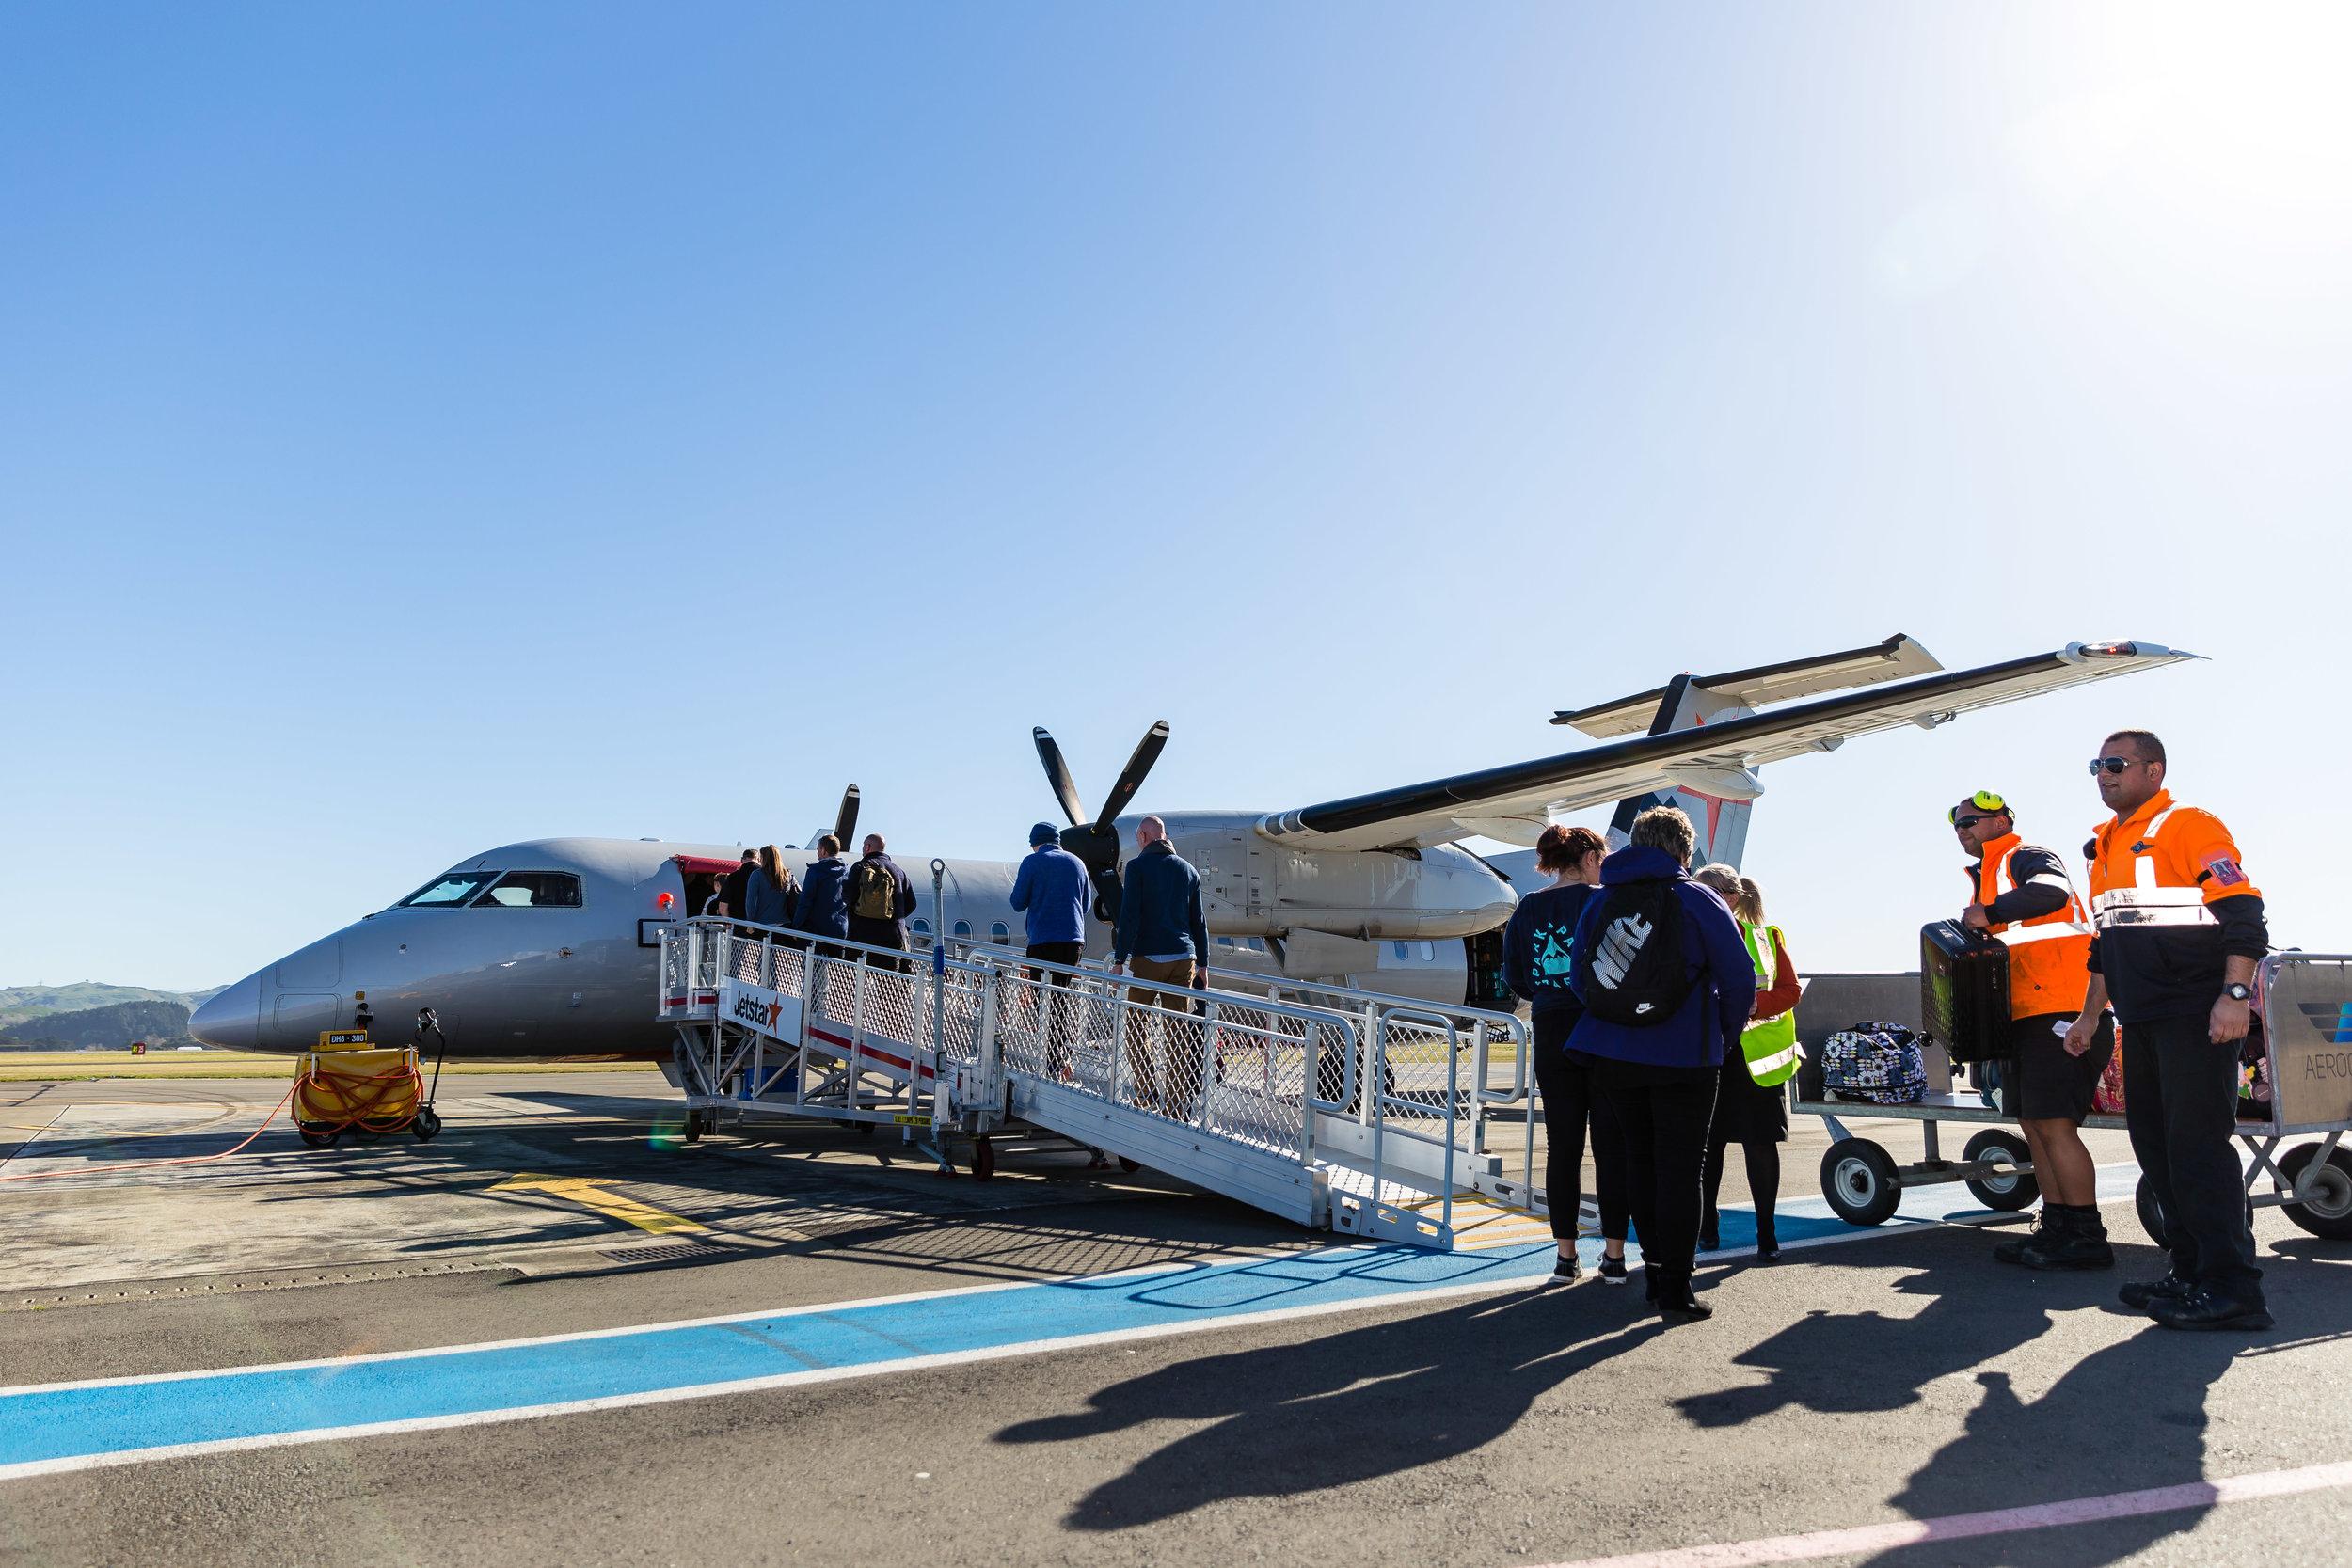 Passengers boarding a Jet Star flight